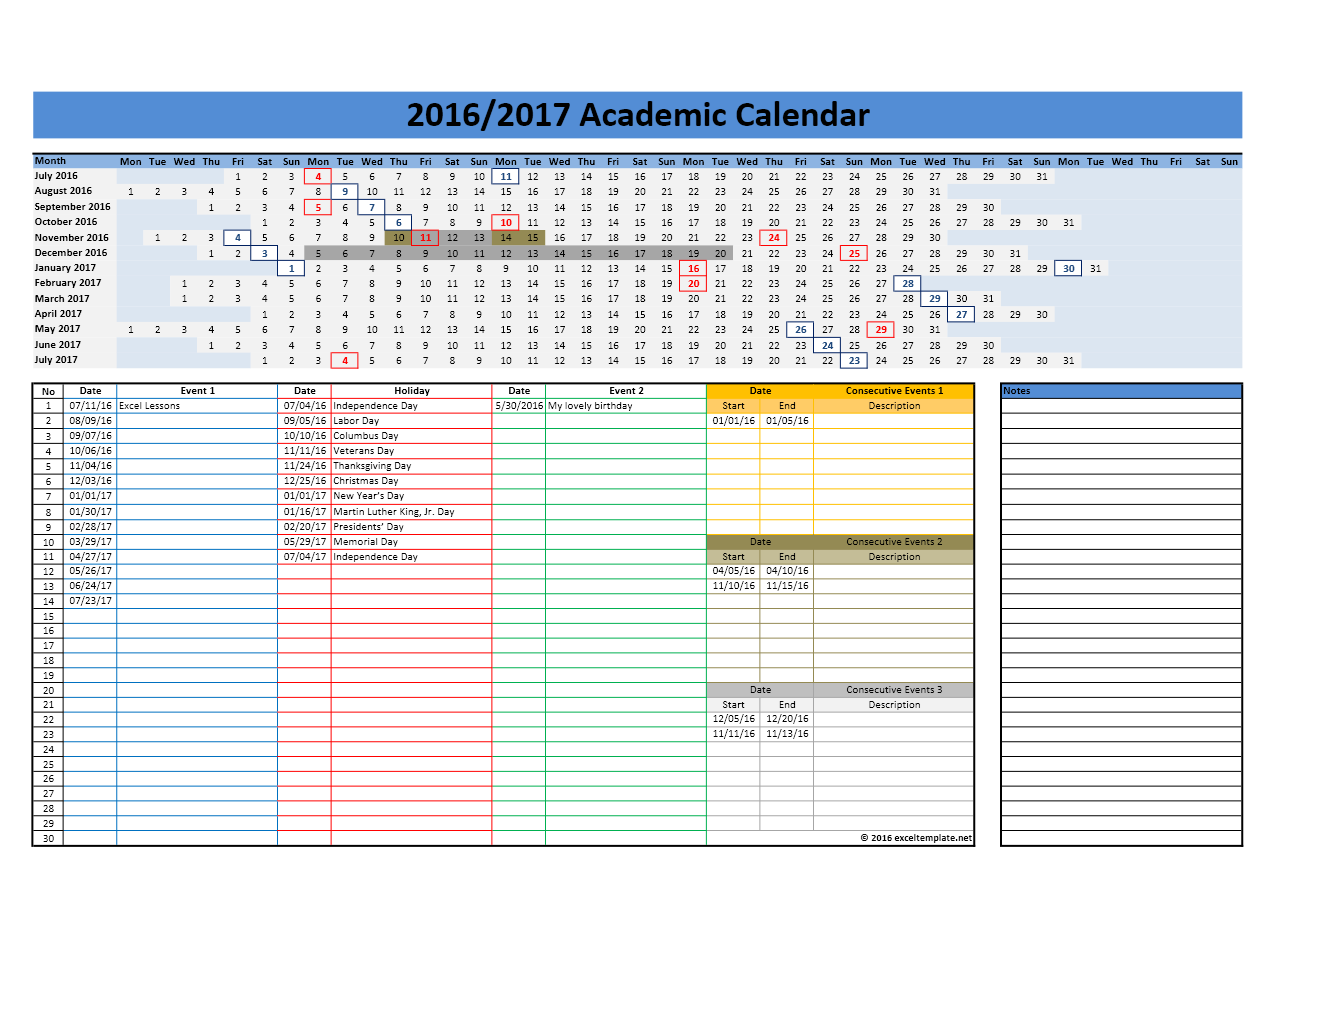 2016/2017 School Calendar Templates | Excel Templates